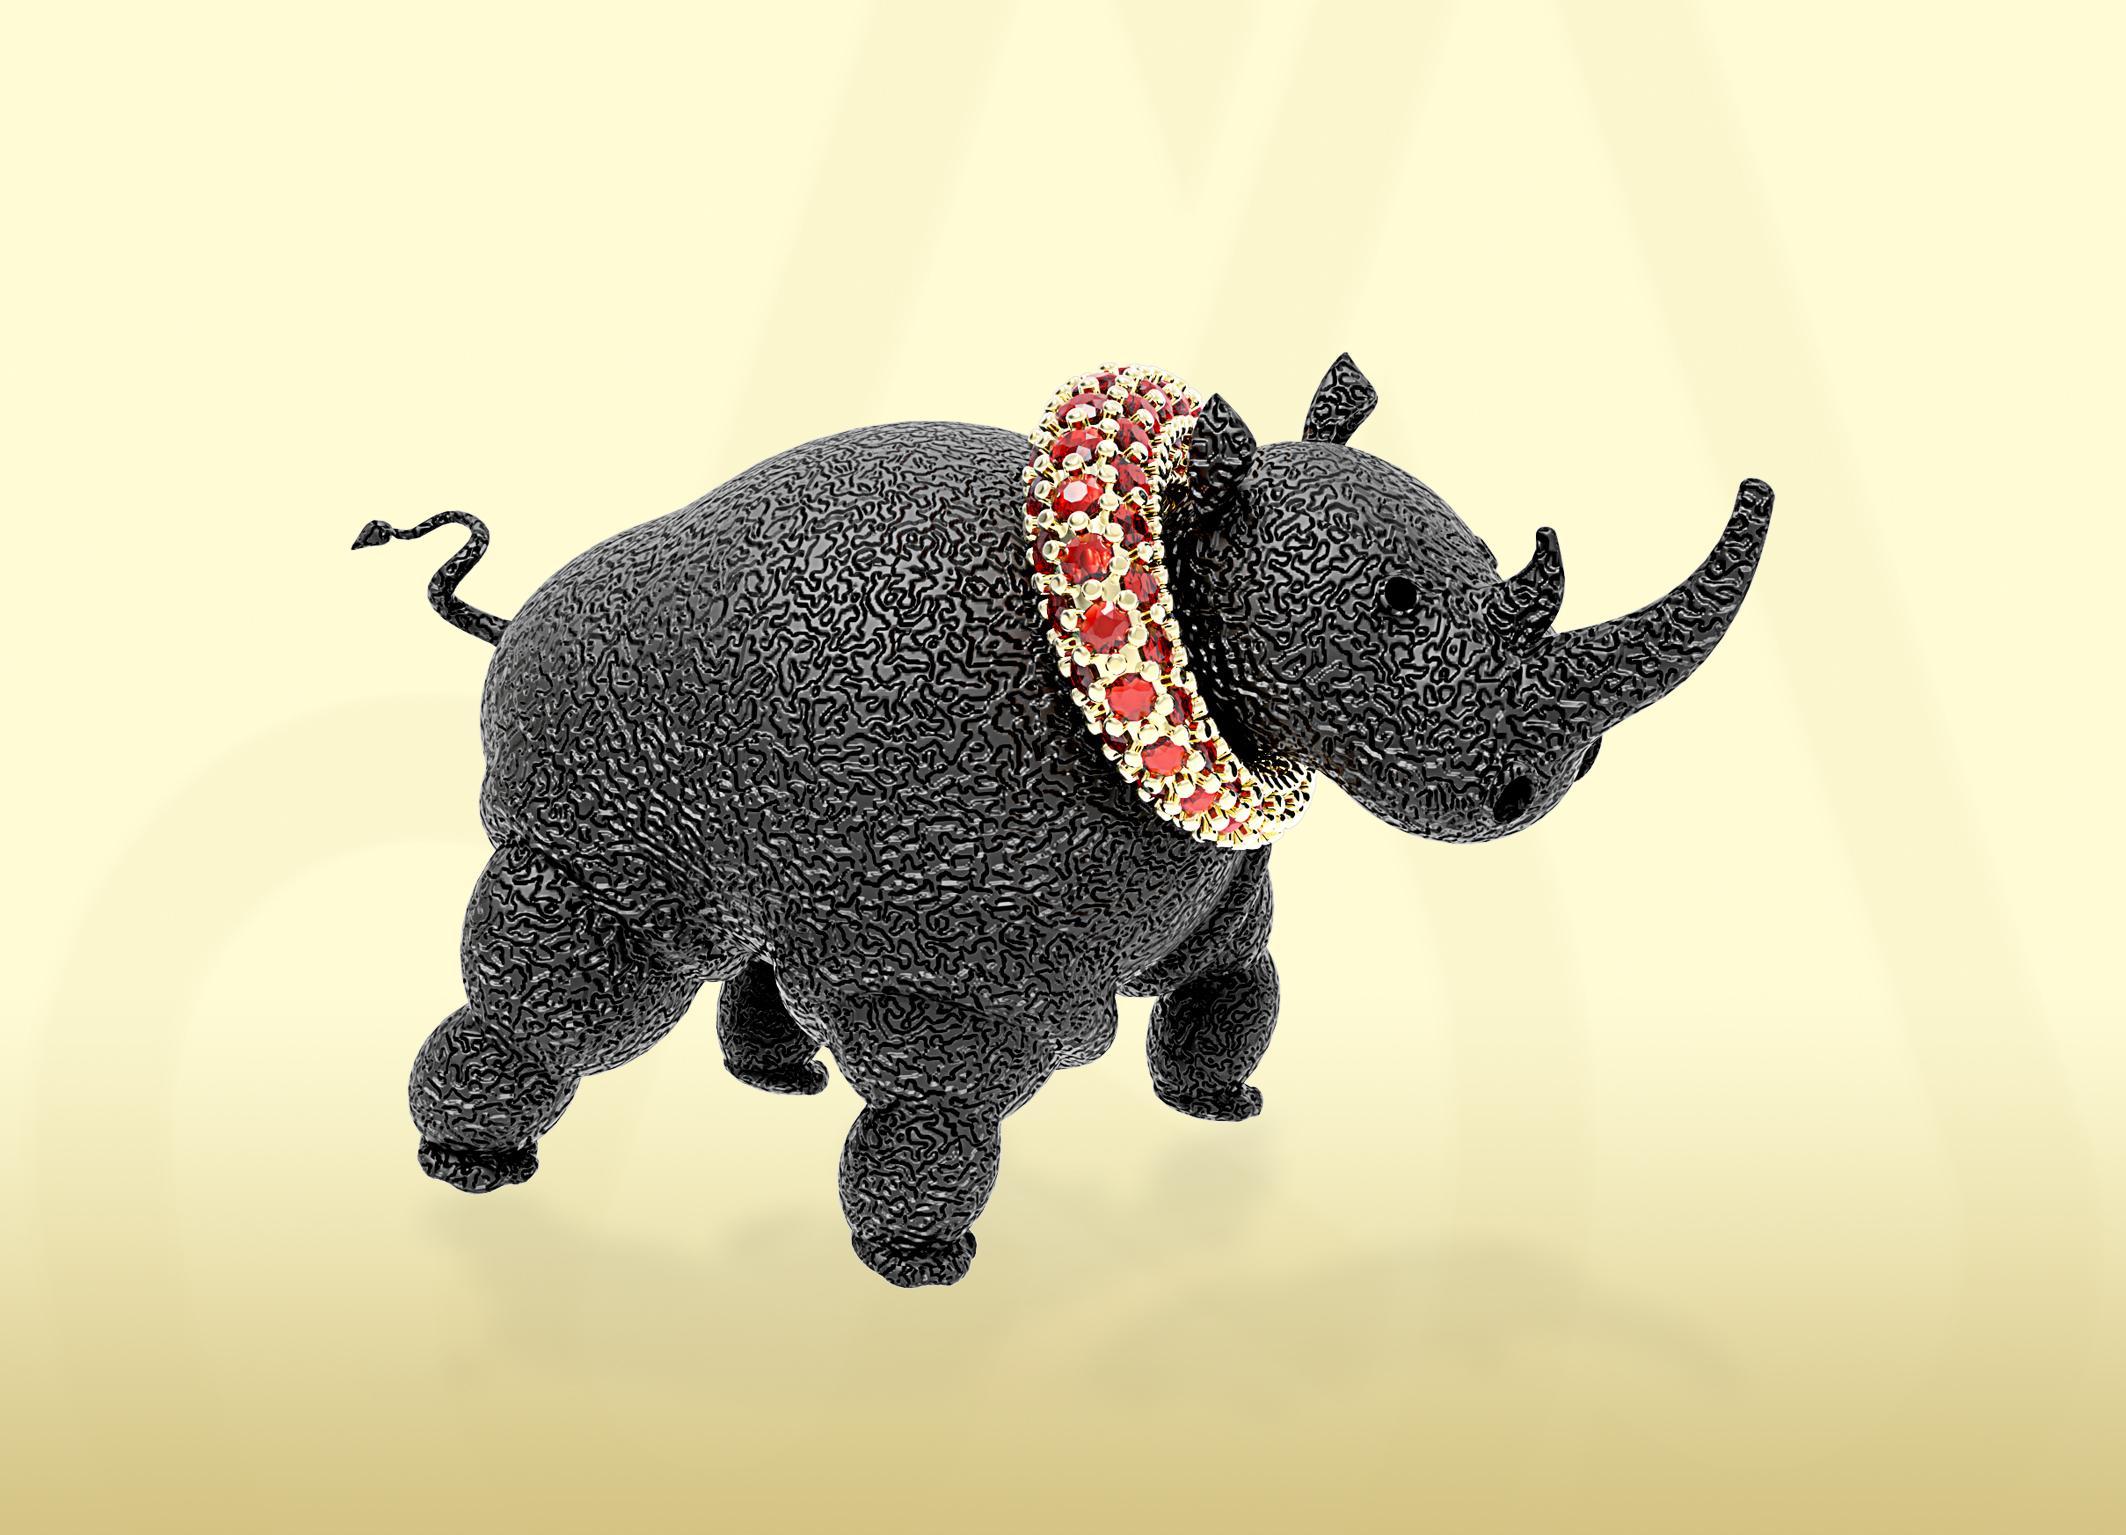 Rhinocerios מידול בריינו